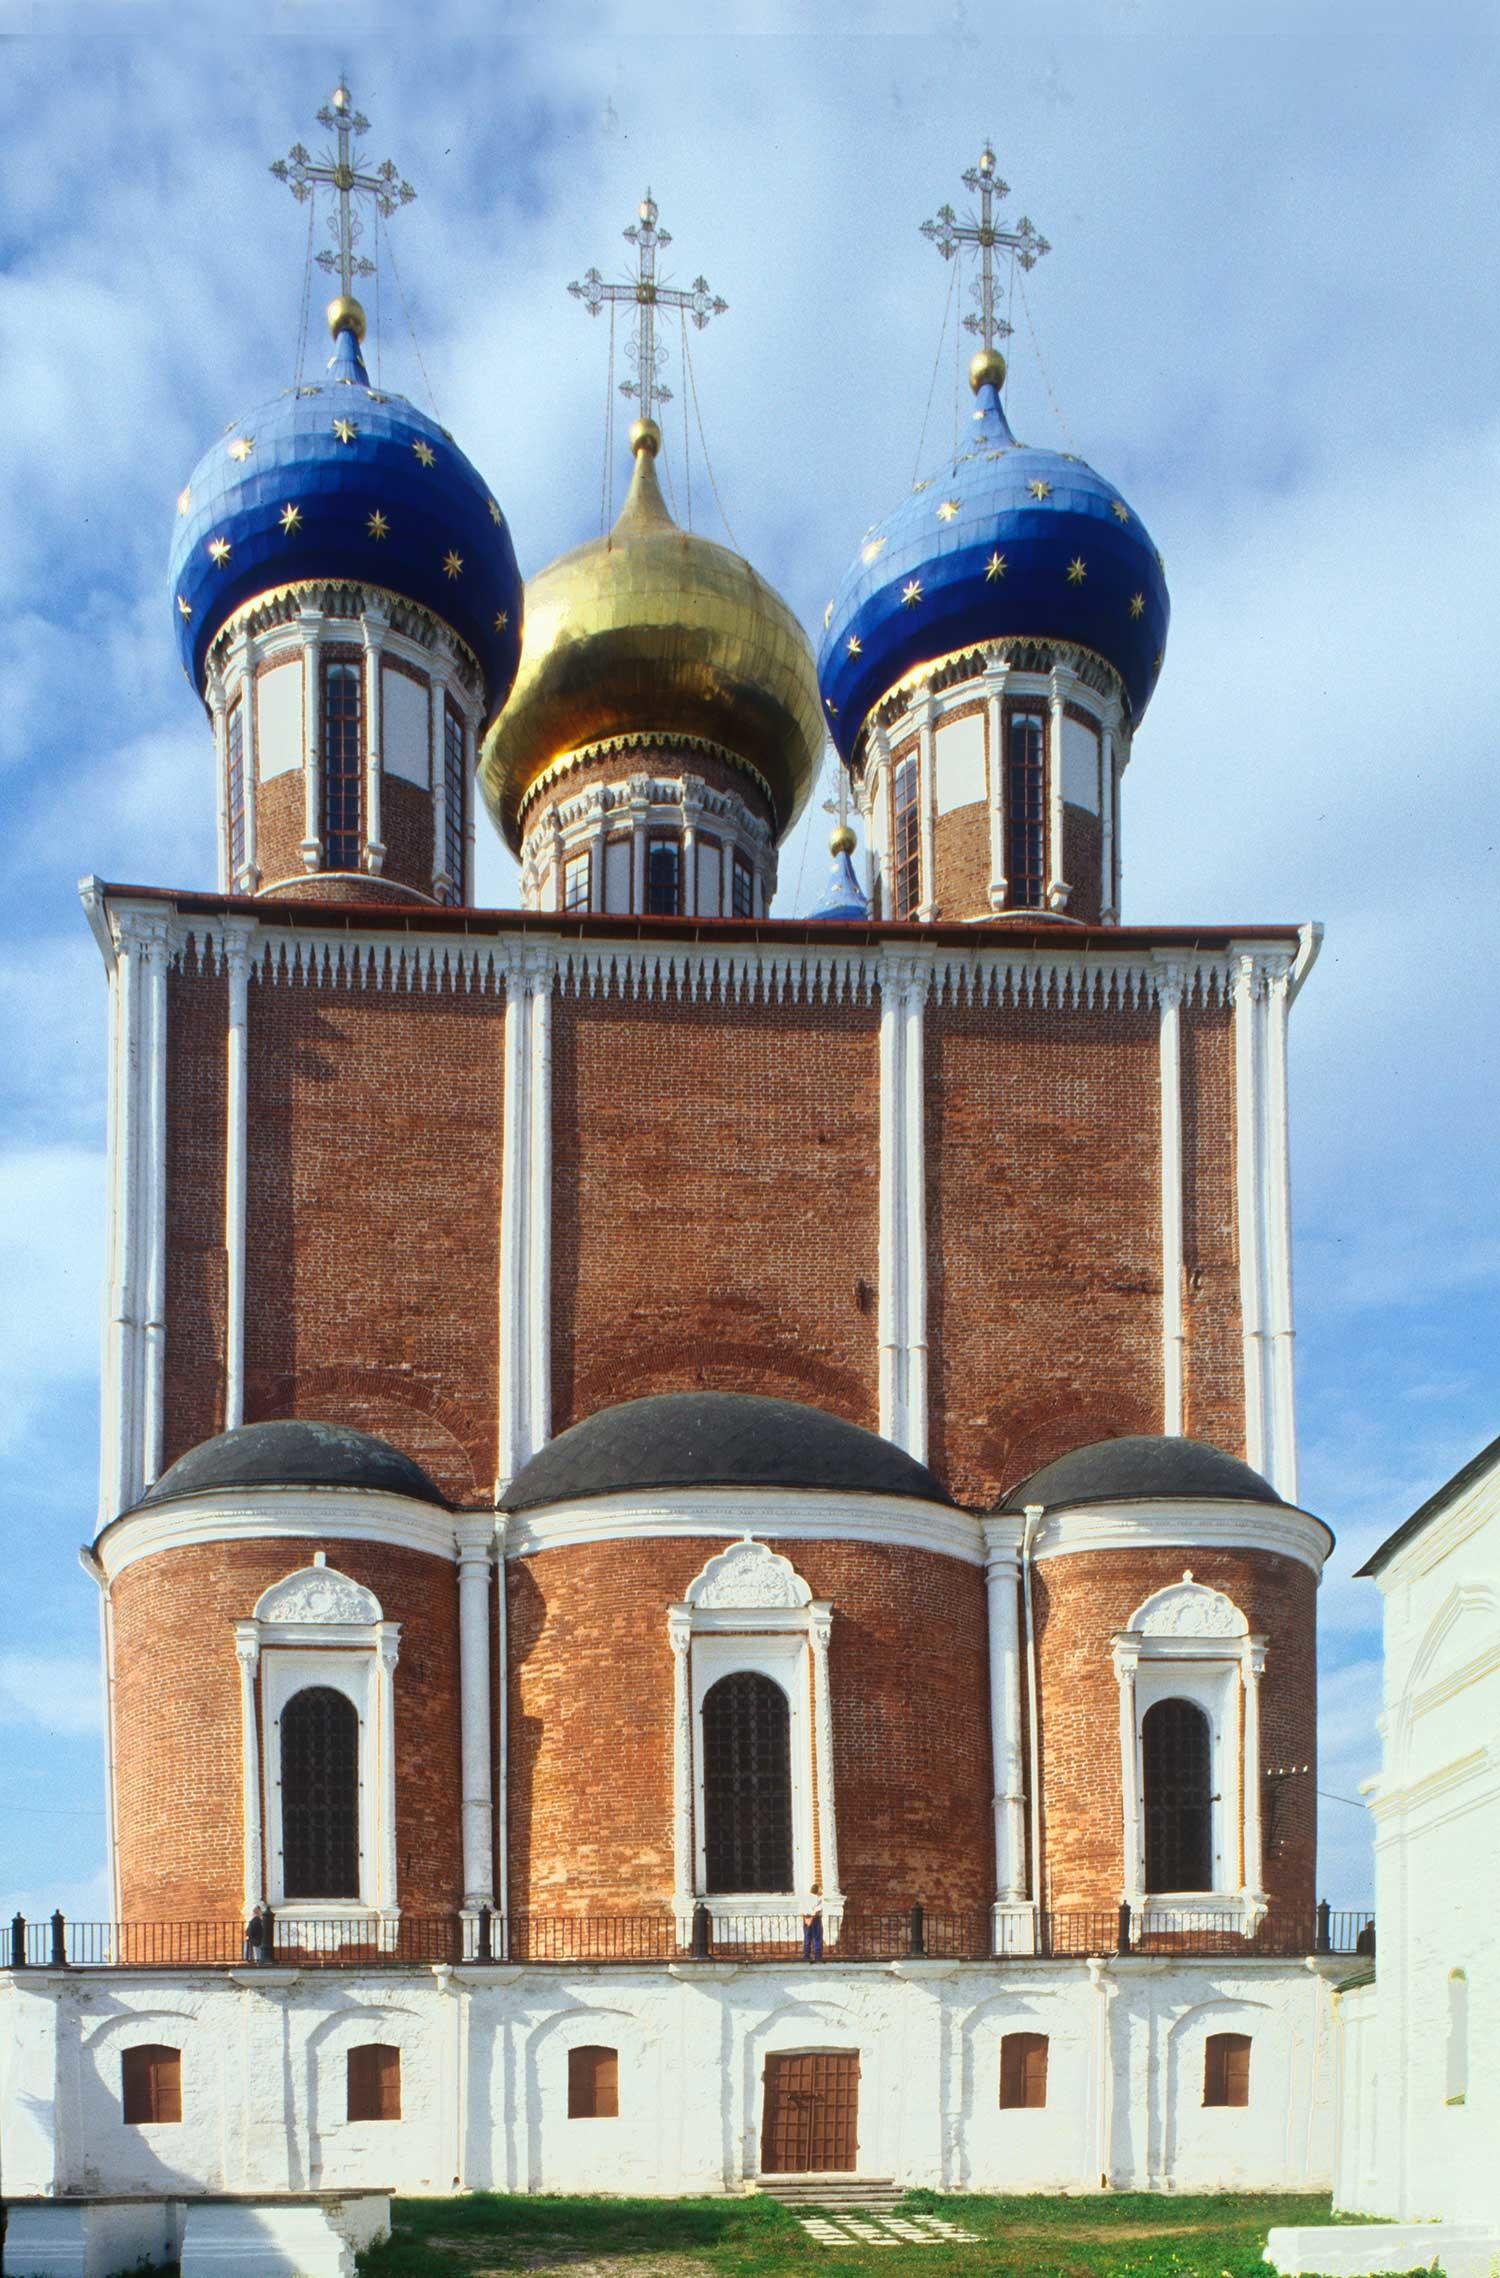 Ryazan Kremlin. Dormition Cathedral, east view. August 28, 2005.